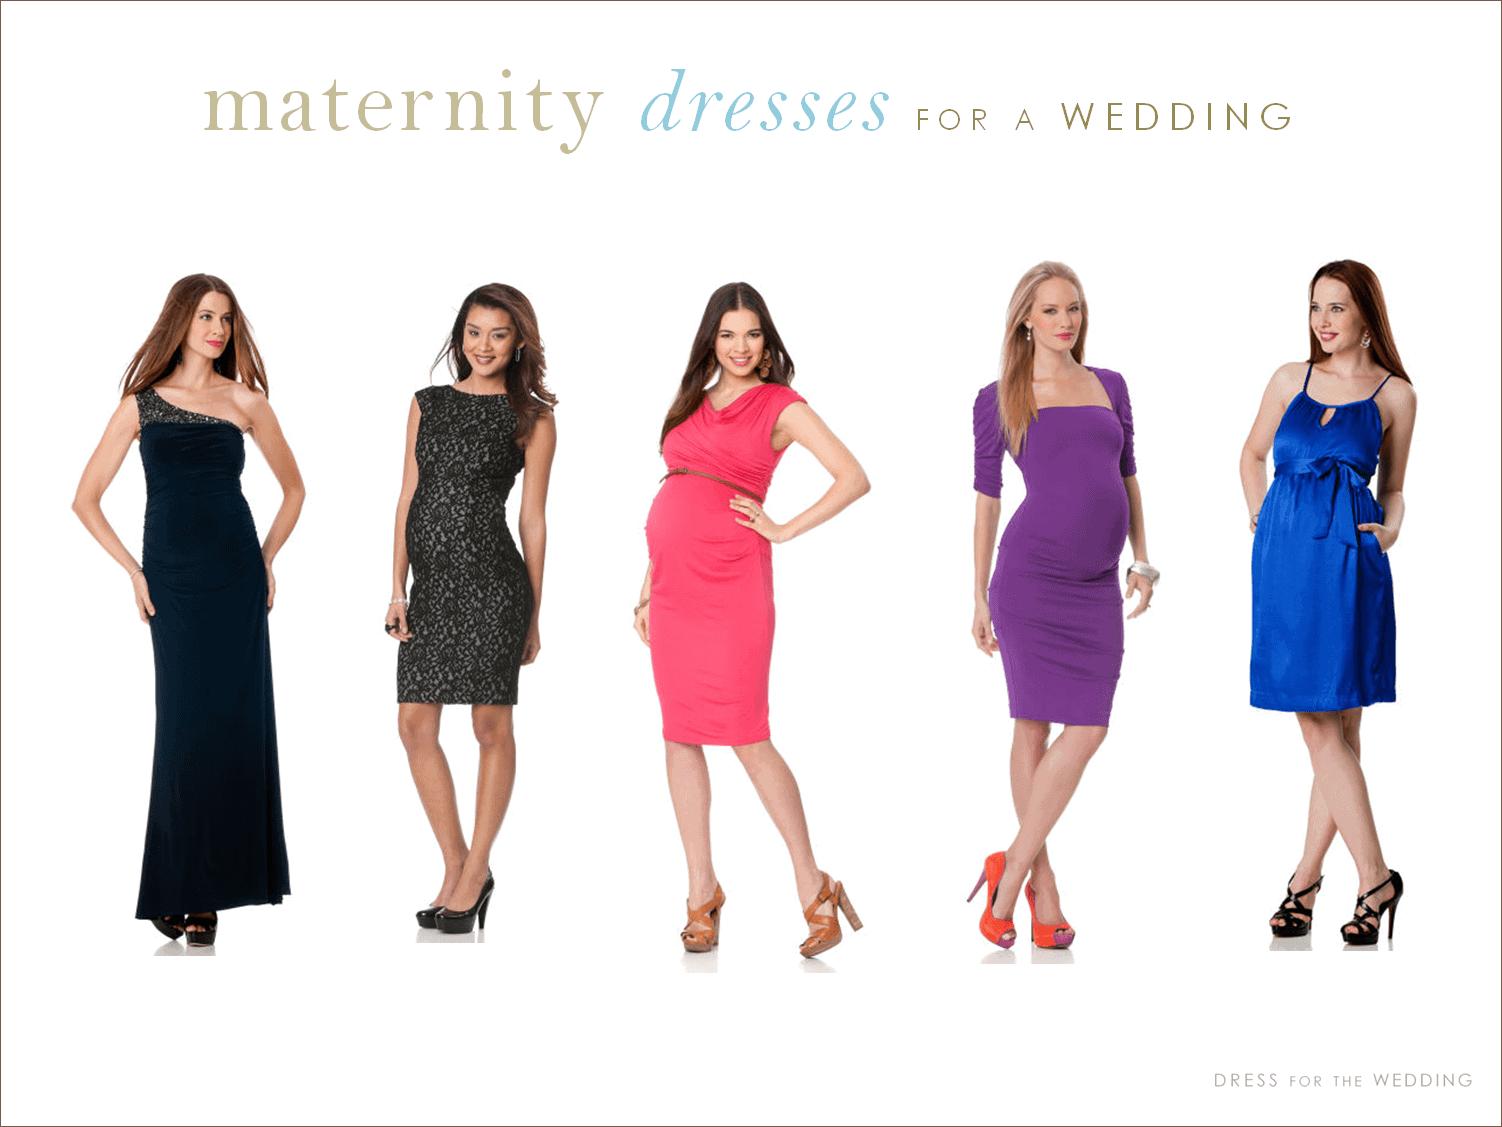 wedding guest maternity dresses dress for a wedding